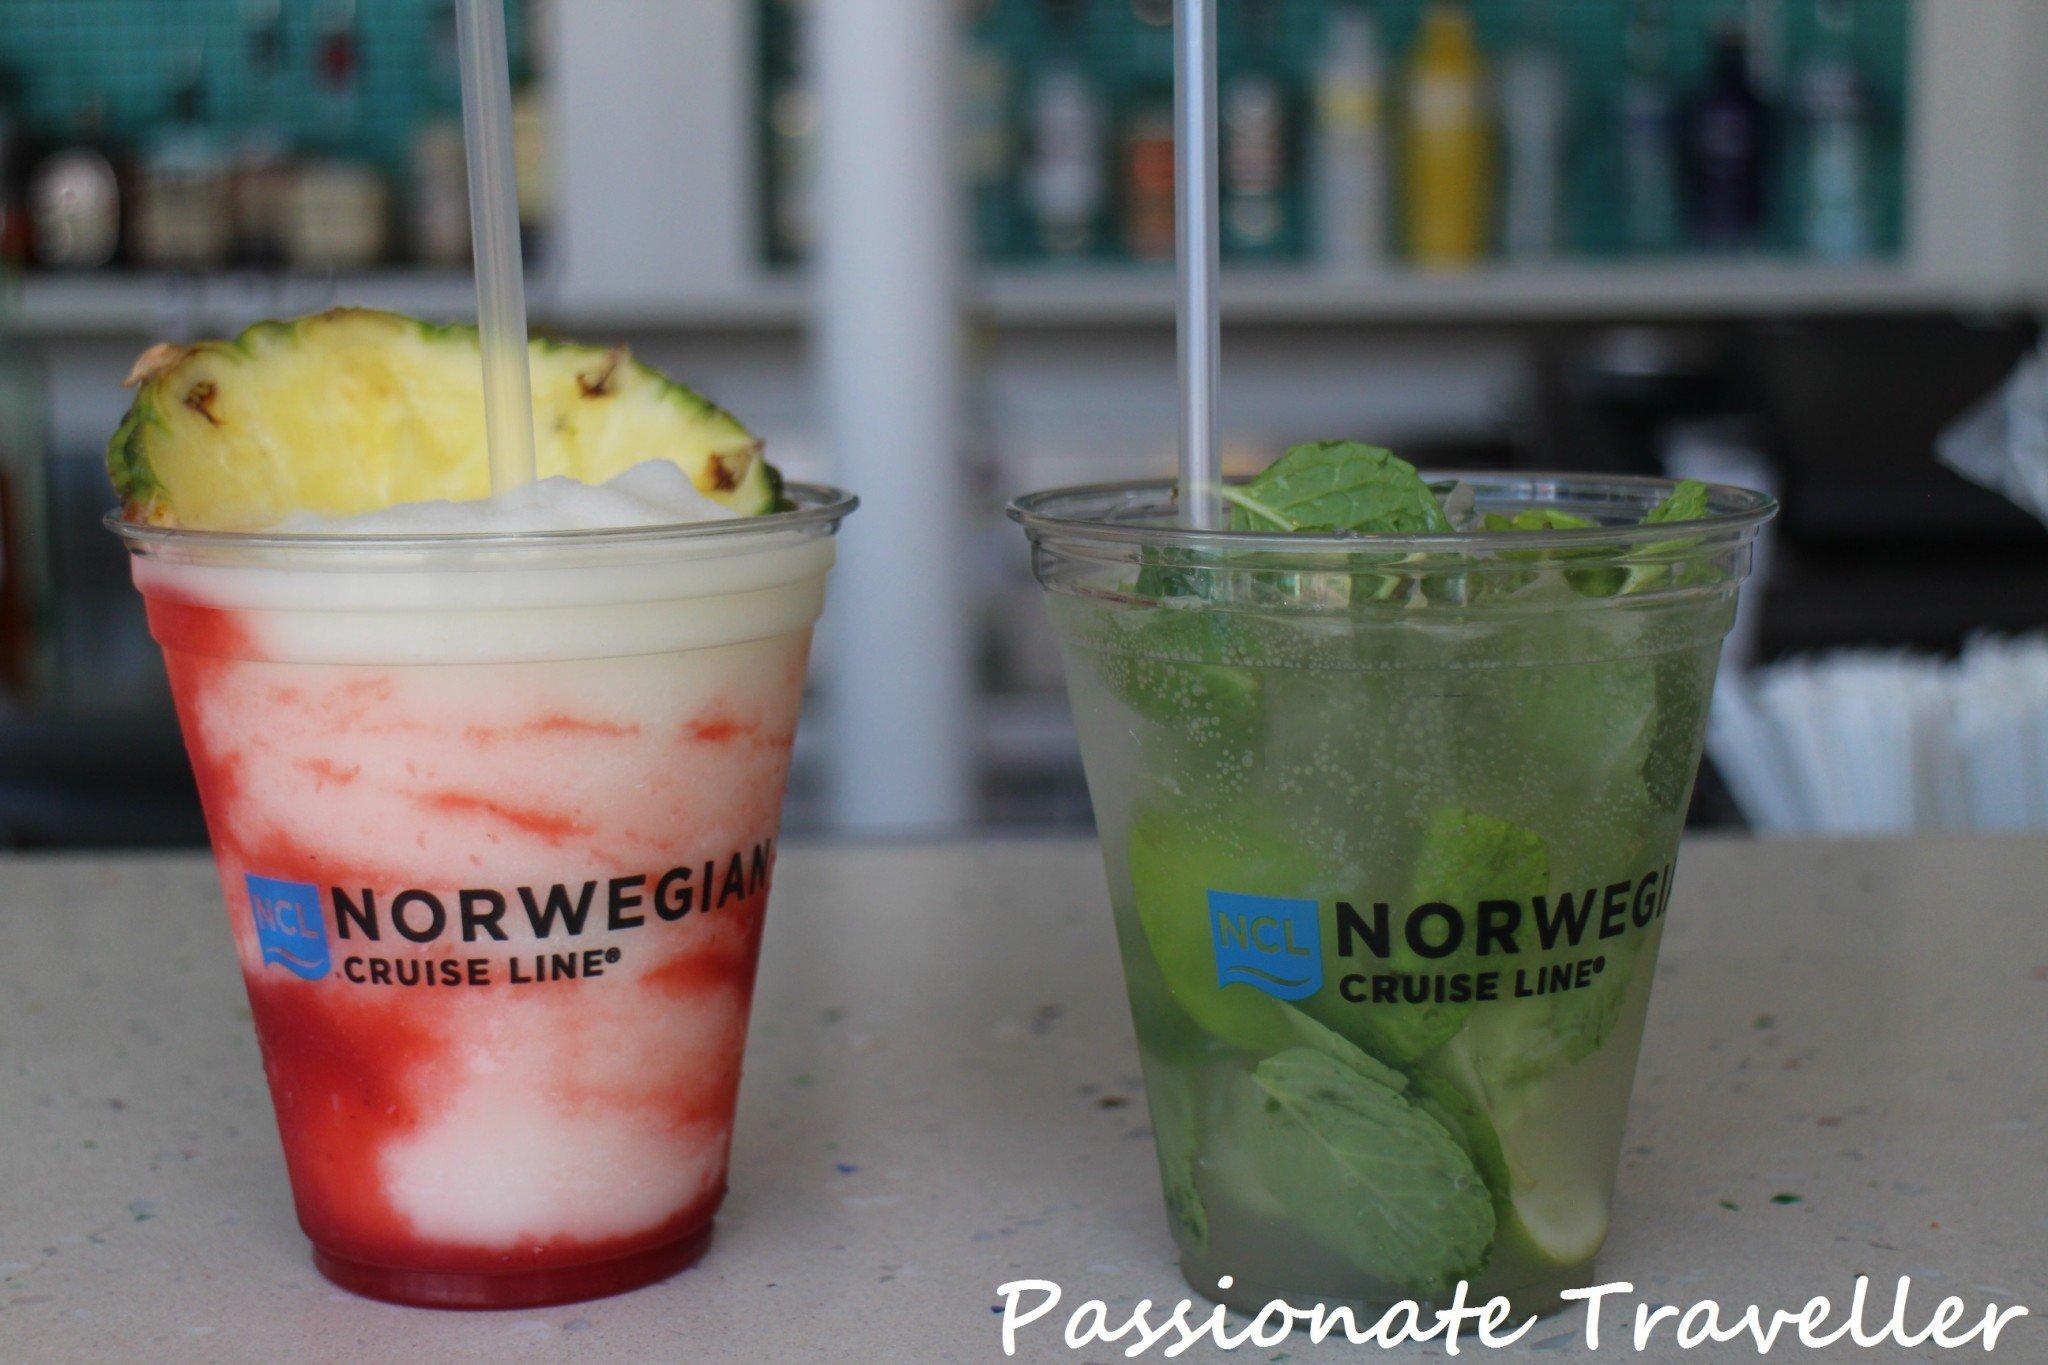 Norwegian Cruise Line UBP